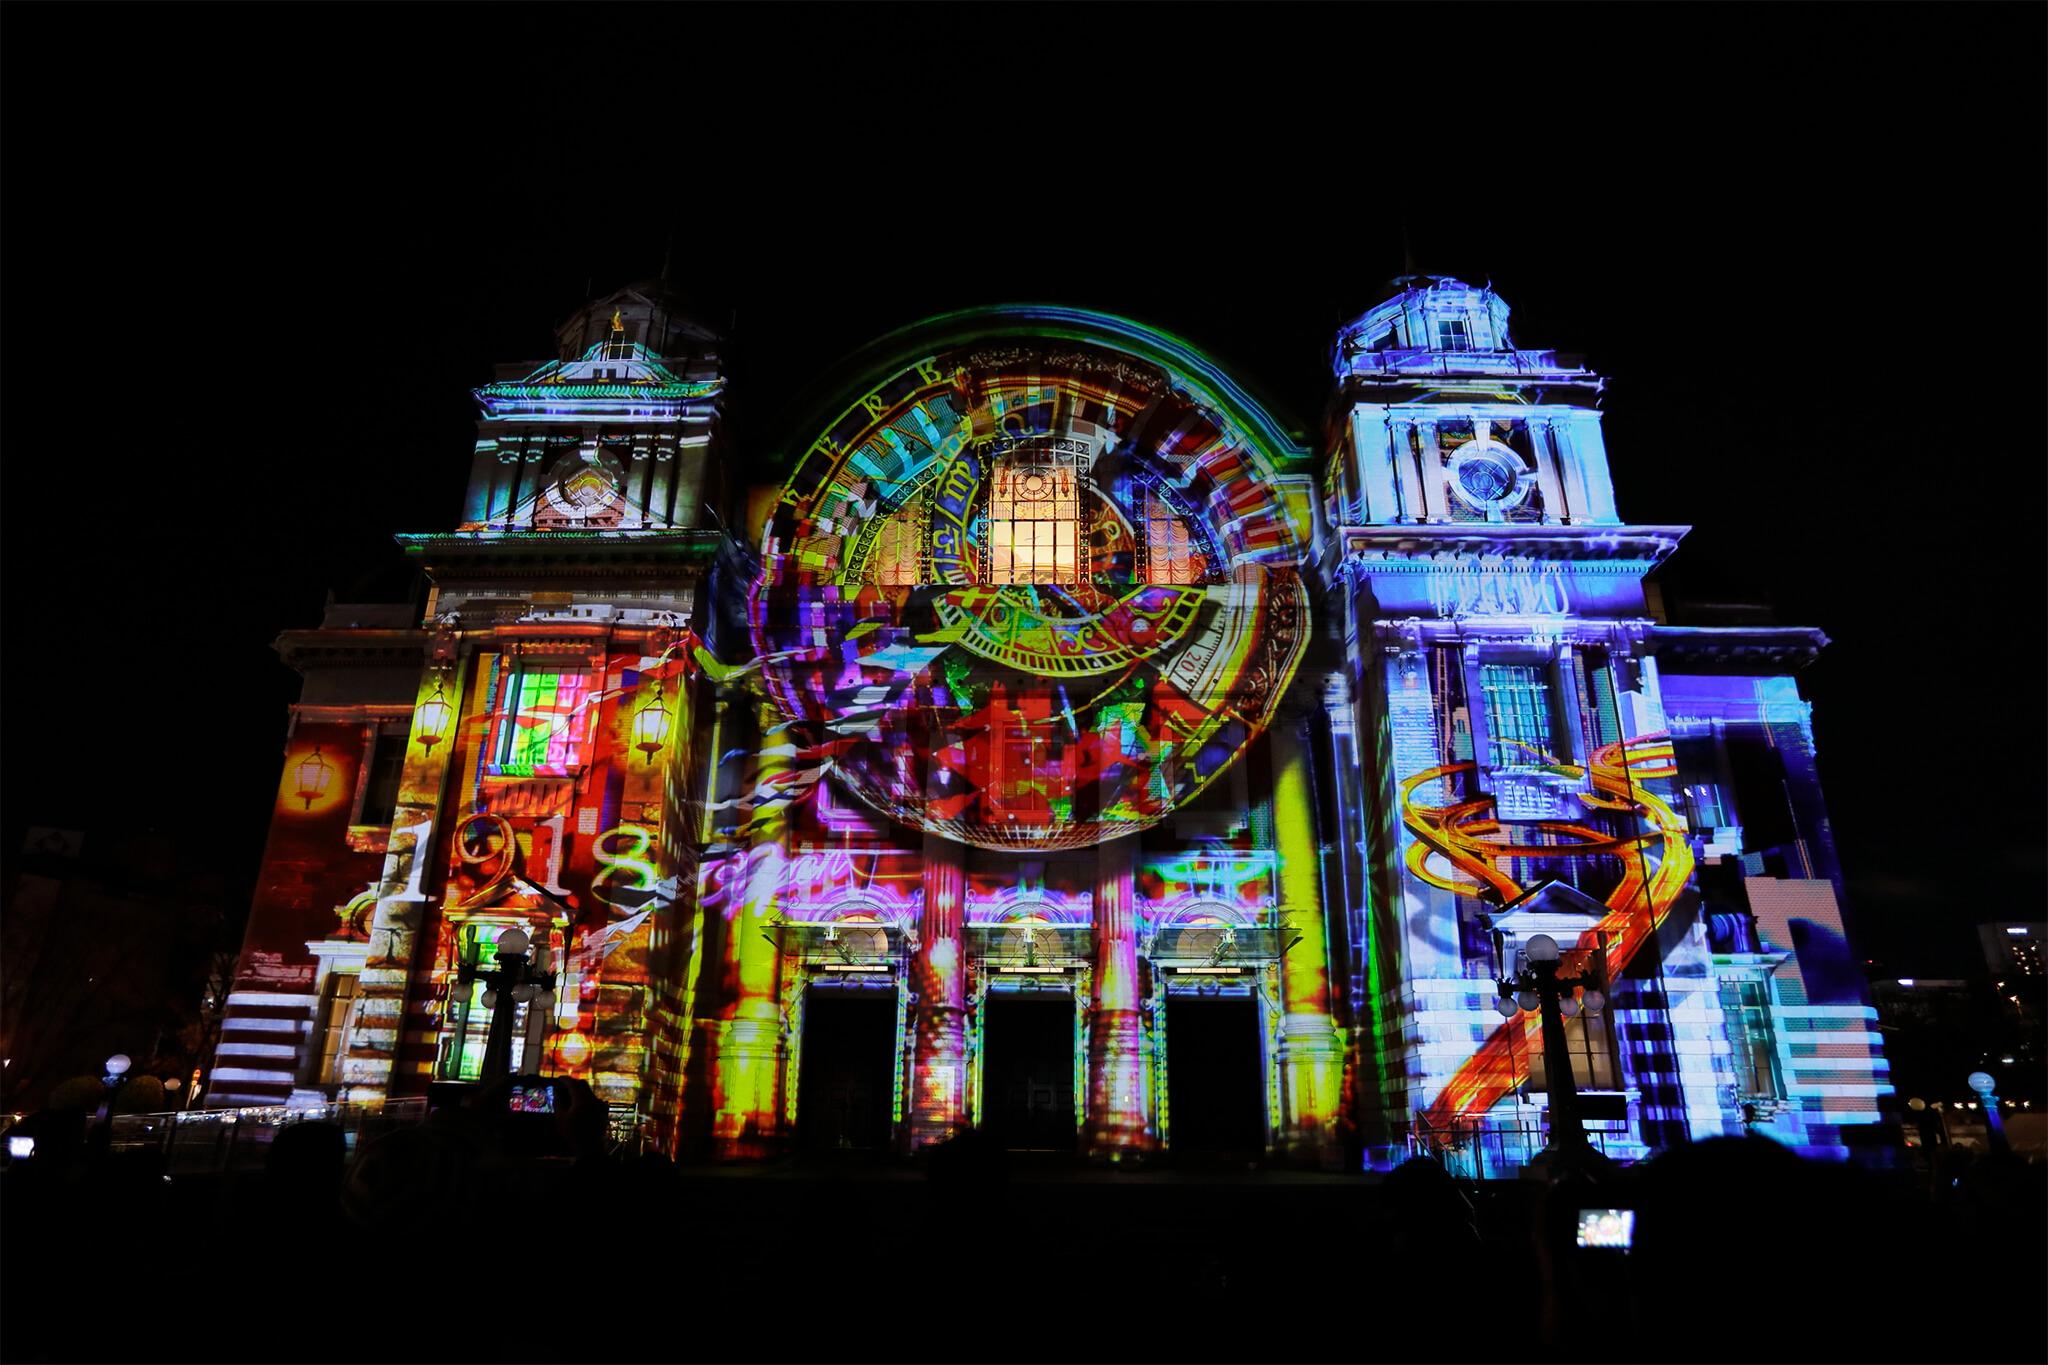 OSAKA光のルネサンス2016「大阪・未来創造プロジェクト」